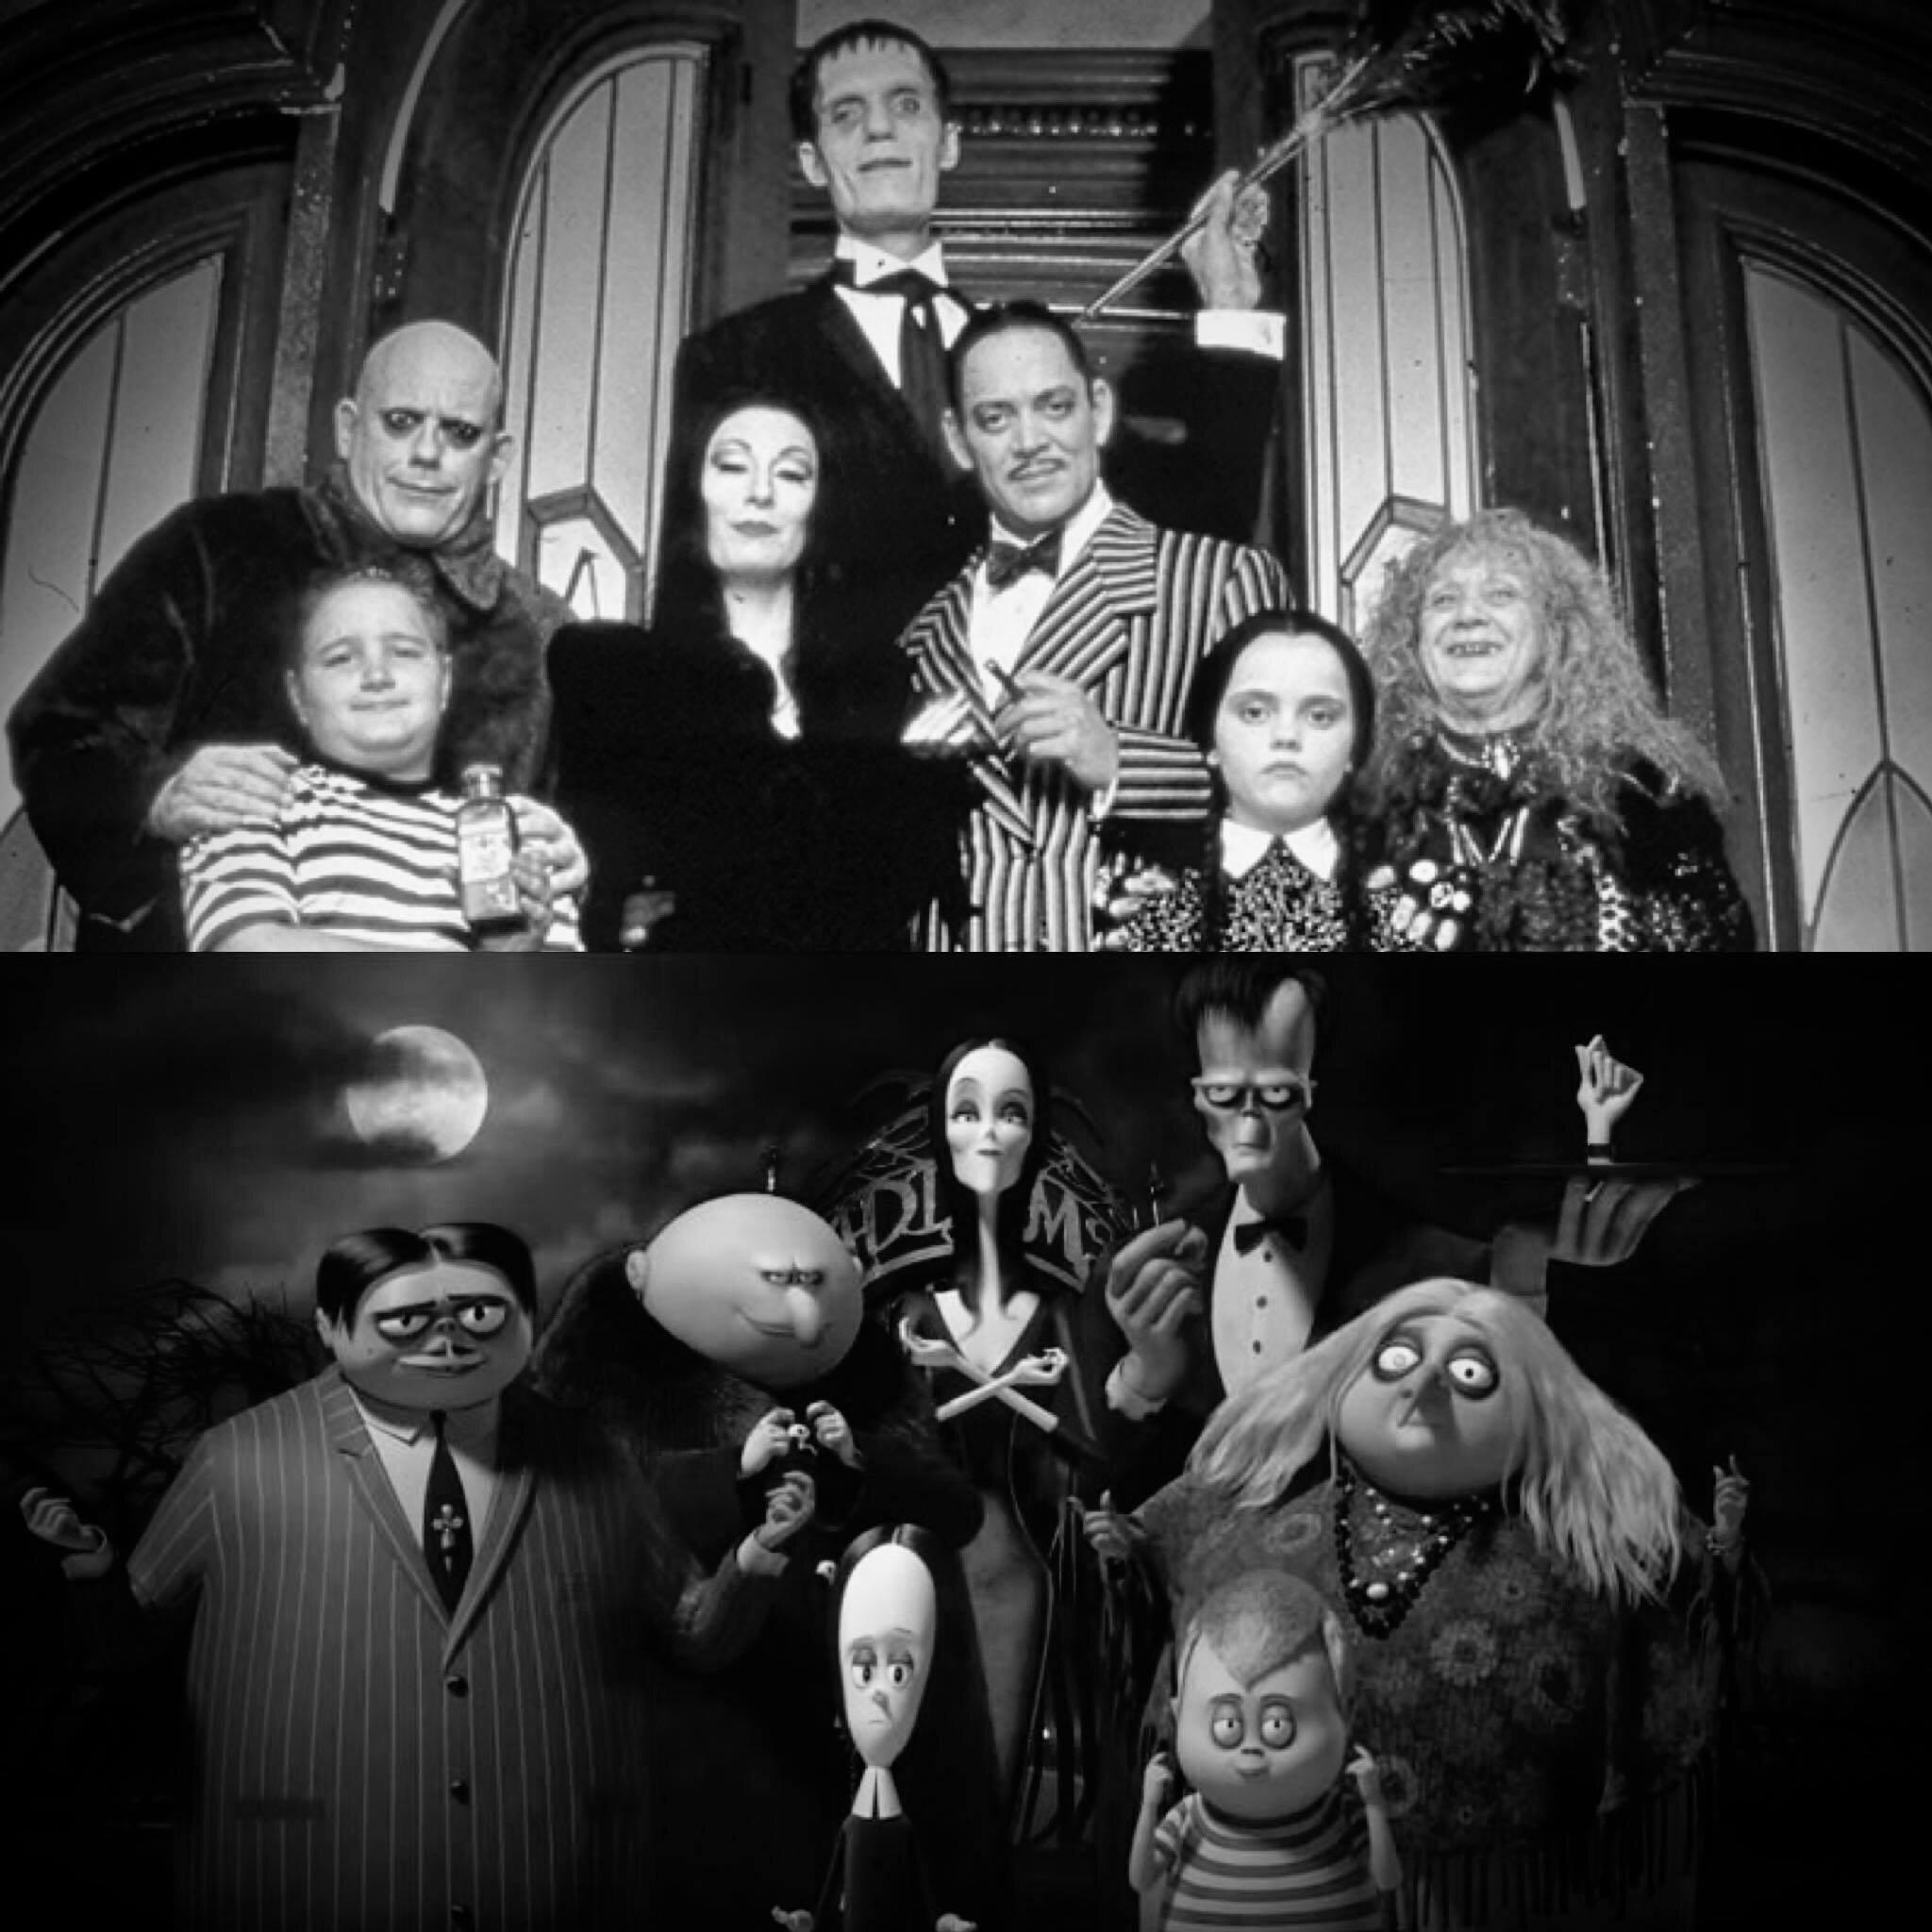 030 The Addams Family 1991 Vs The Addams Family 2019